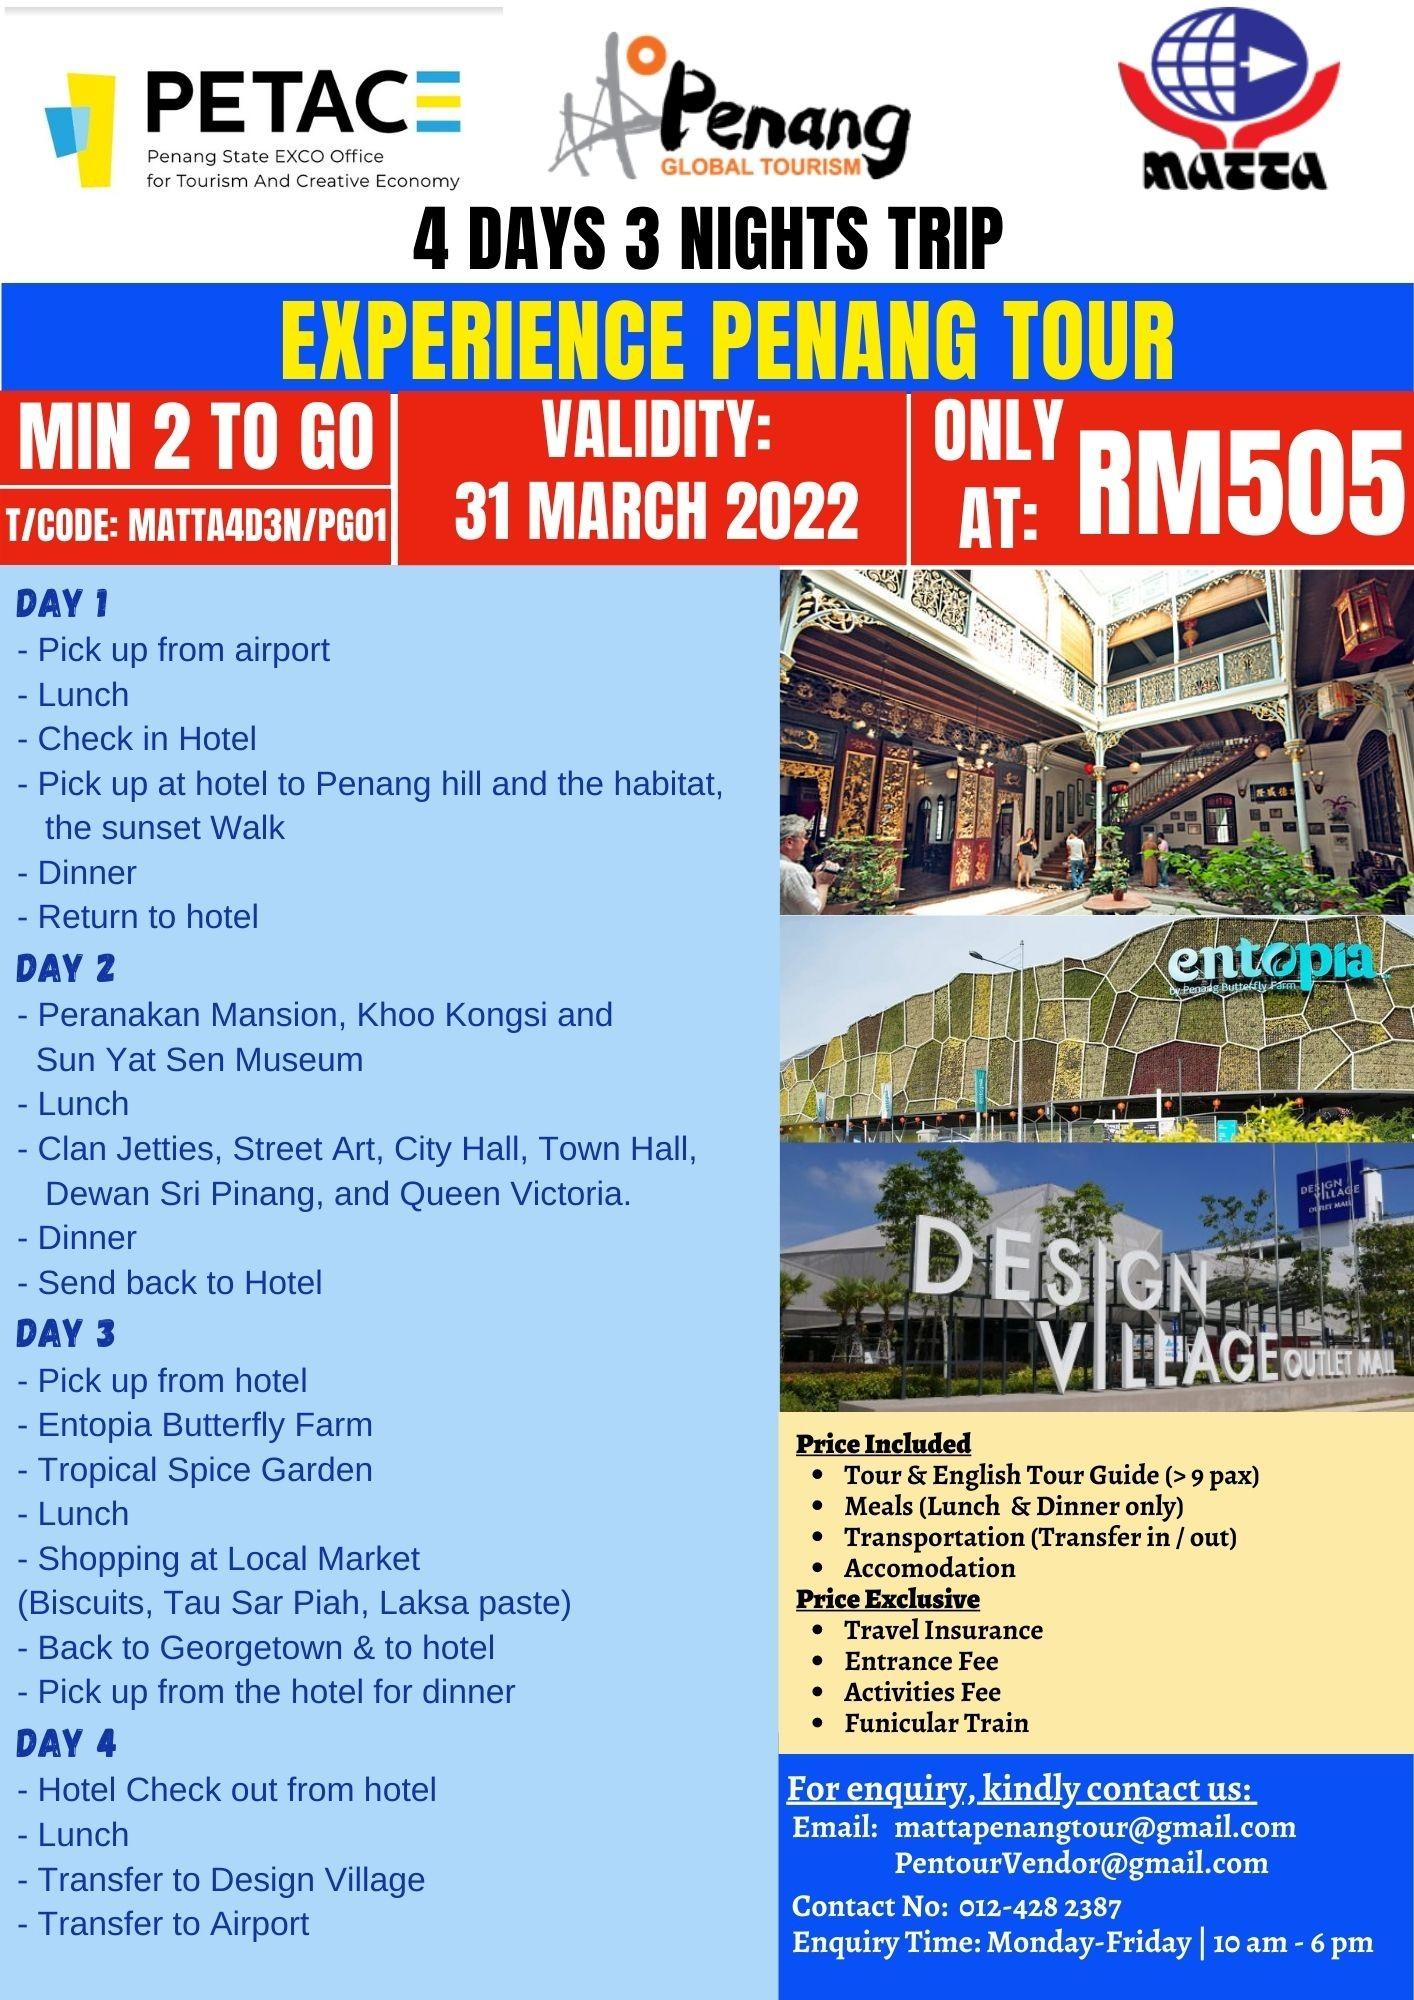 4 Days 3 Nights Trip - Experience Penang Tour